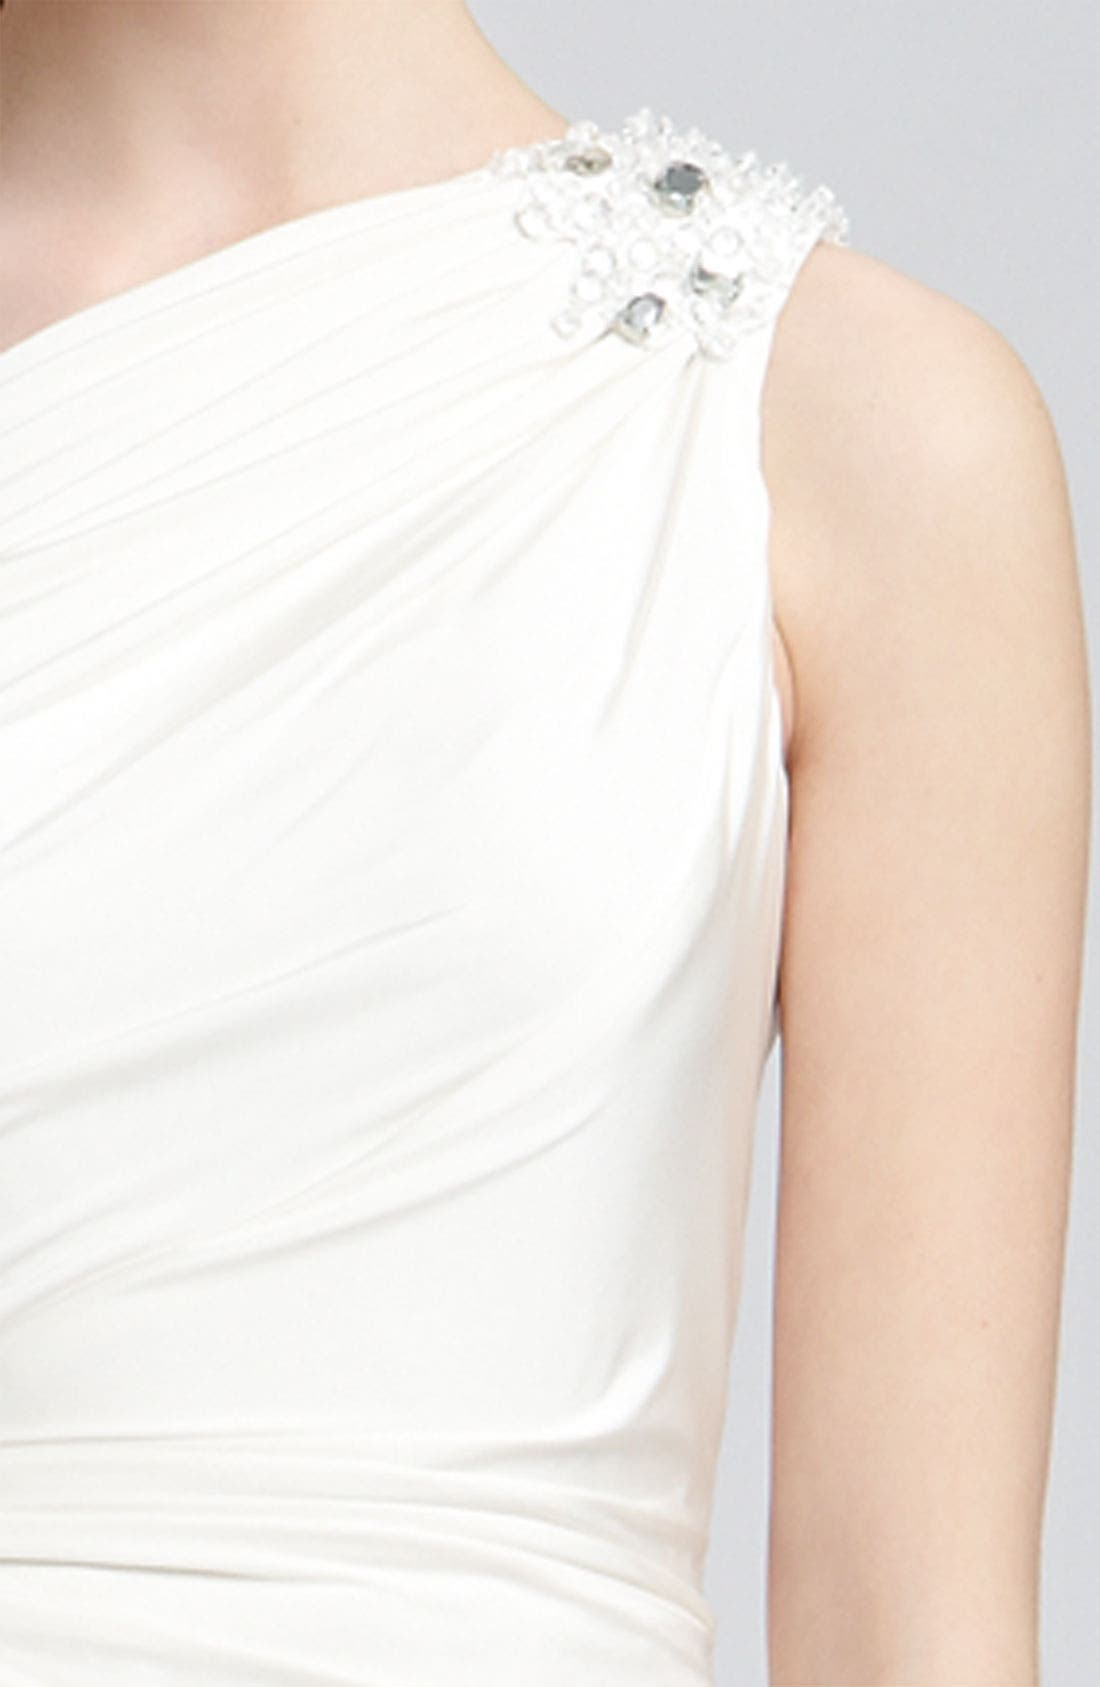 TADASHI SHOJI, Beaded Jersey One Shoulder Gown, Alternate thumbnail 2, color, 900